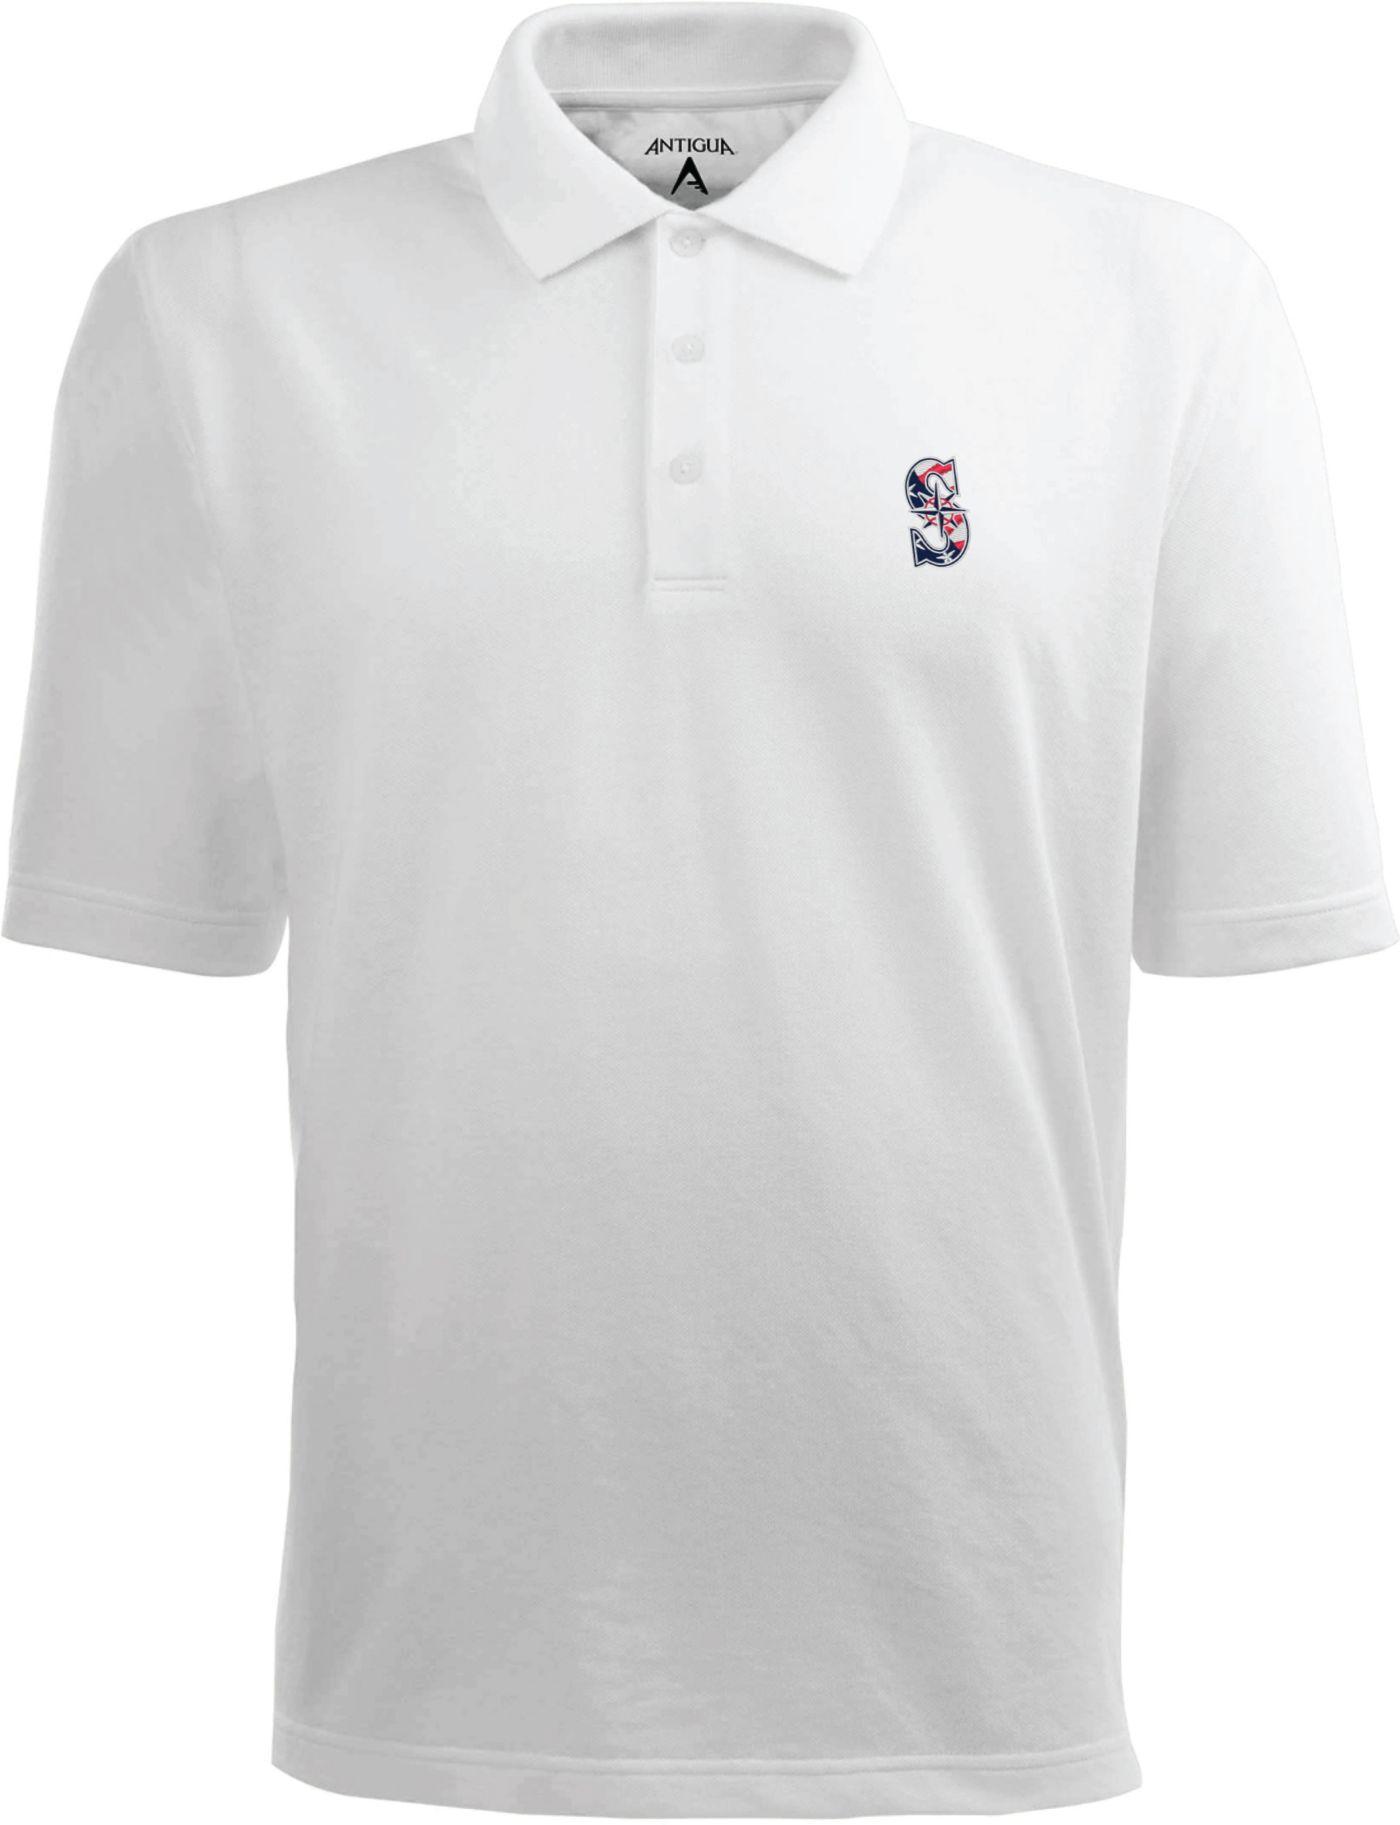 Antigua Men's Seattle Mariners Xtra-Lite Patriotic Logo White Pique Performance Polo